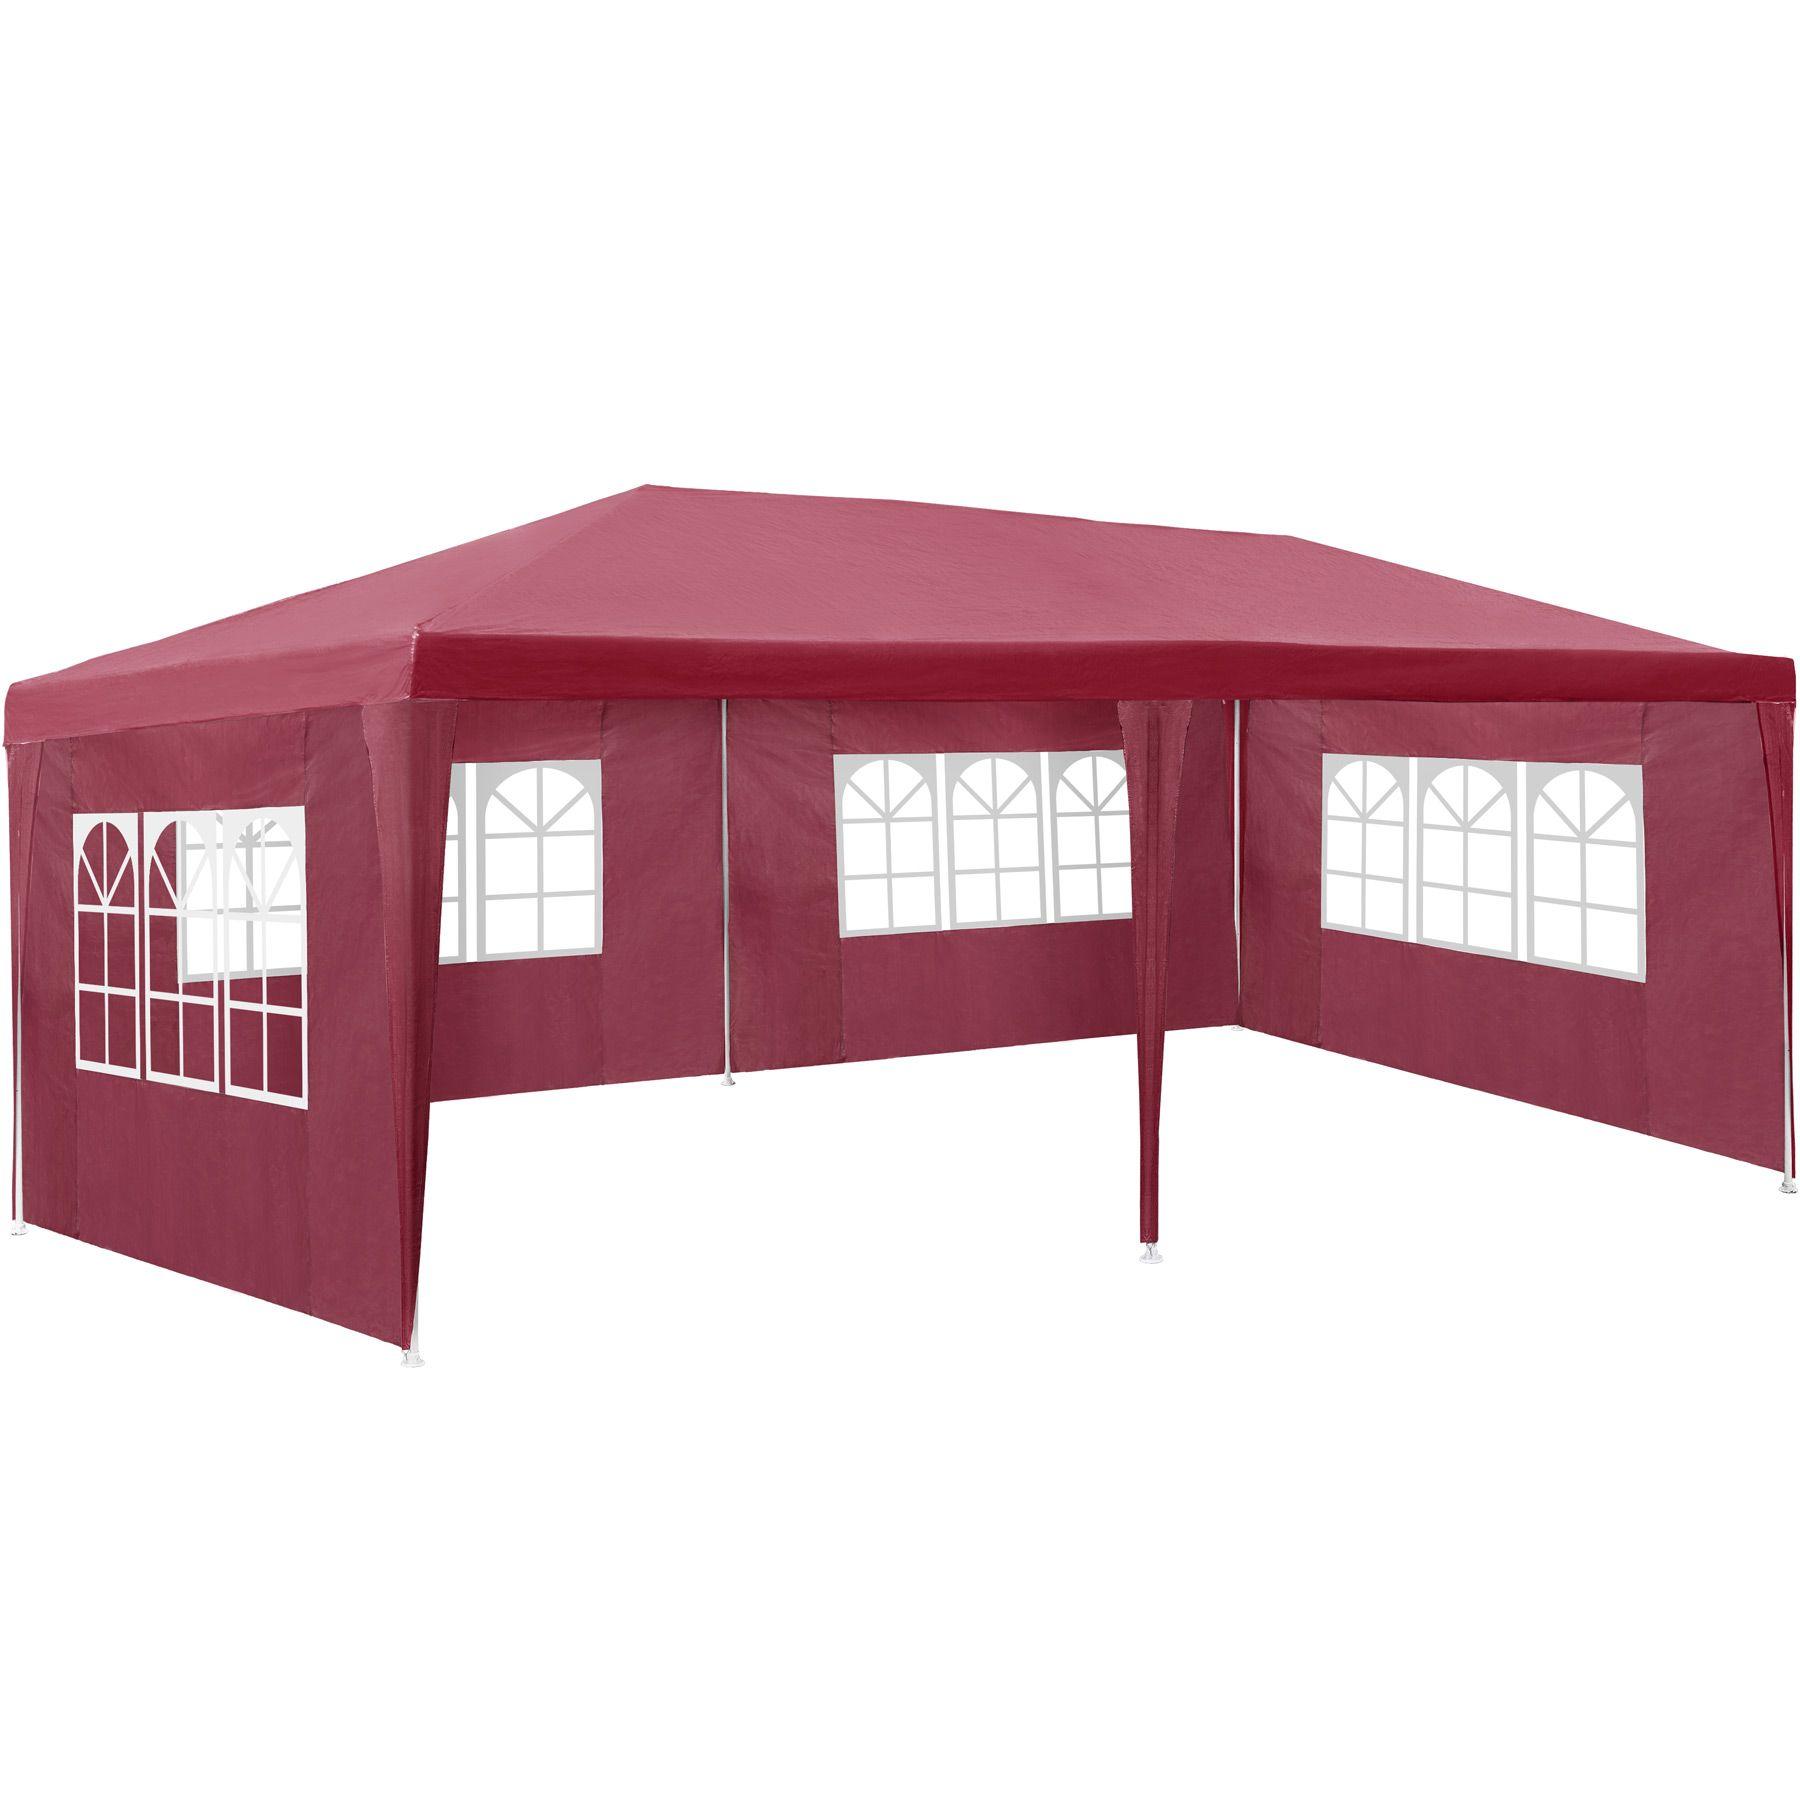 pavillon 3x6 m partyzelt gartenzelt festzelt zelt gartenpavillon bierzelt ebay. Black Bedroom Furniture Sets. Home Design Ideas